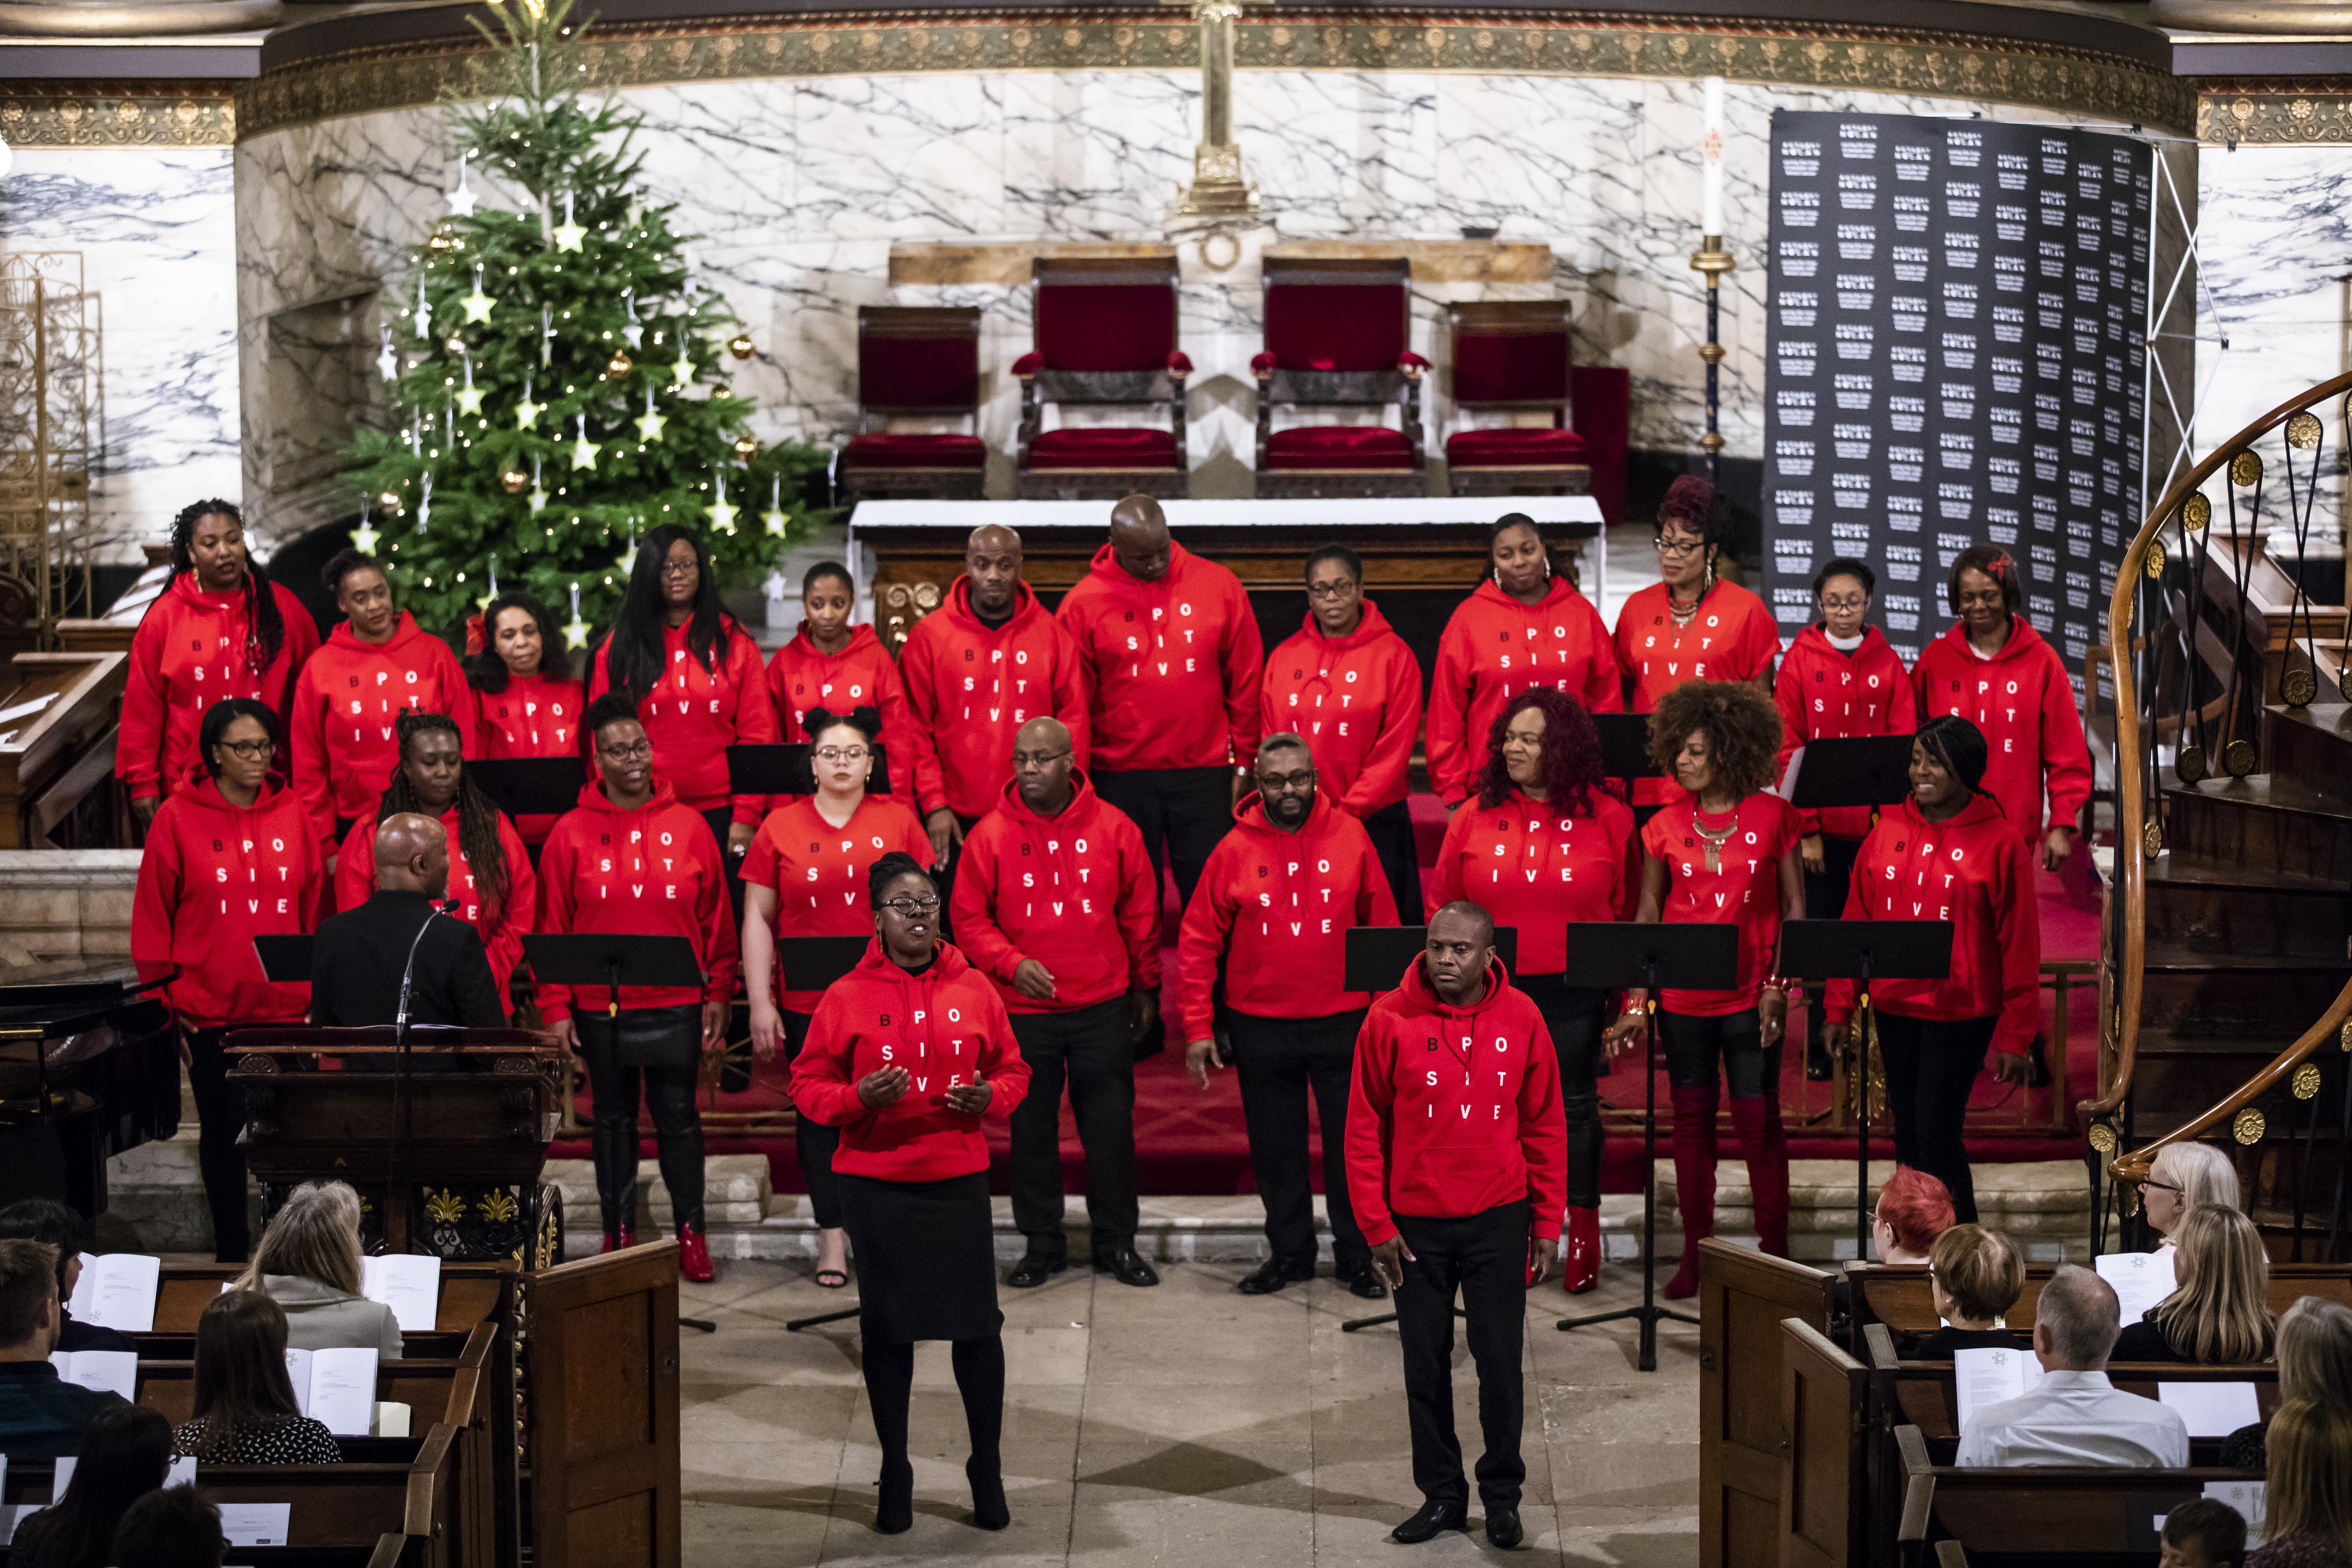 The choir (wearing red hoodies) perform at St Pancras Church